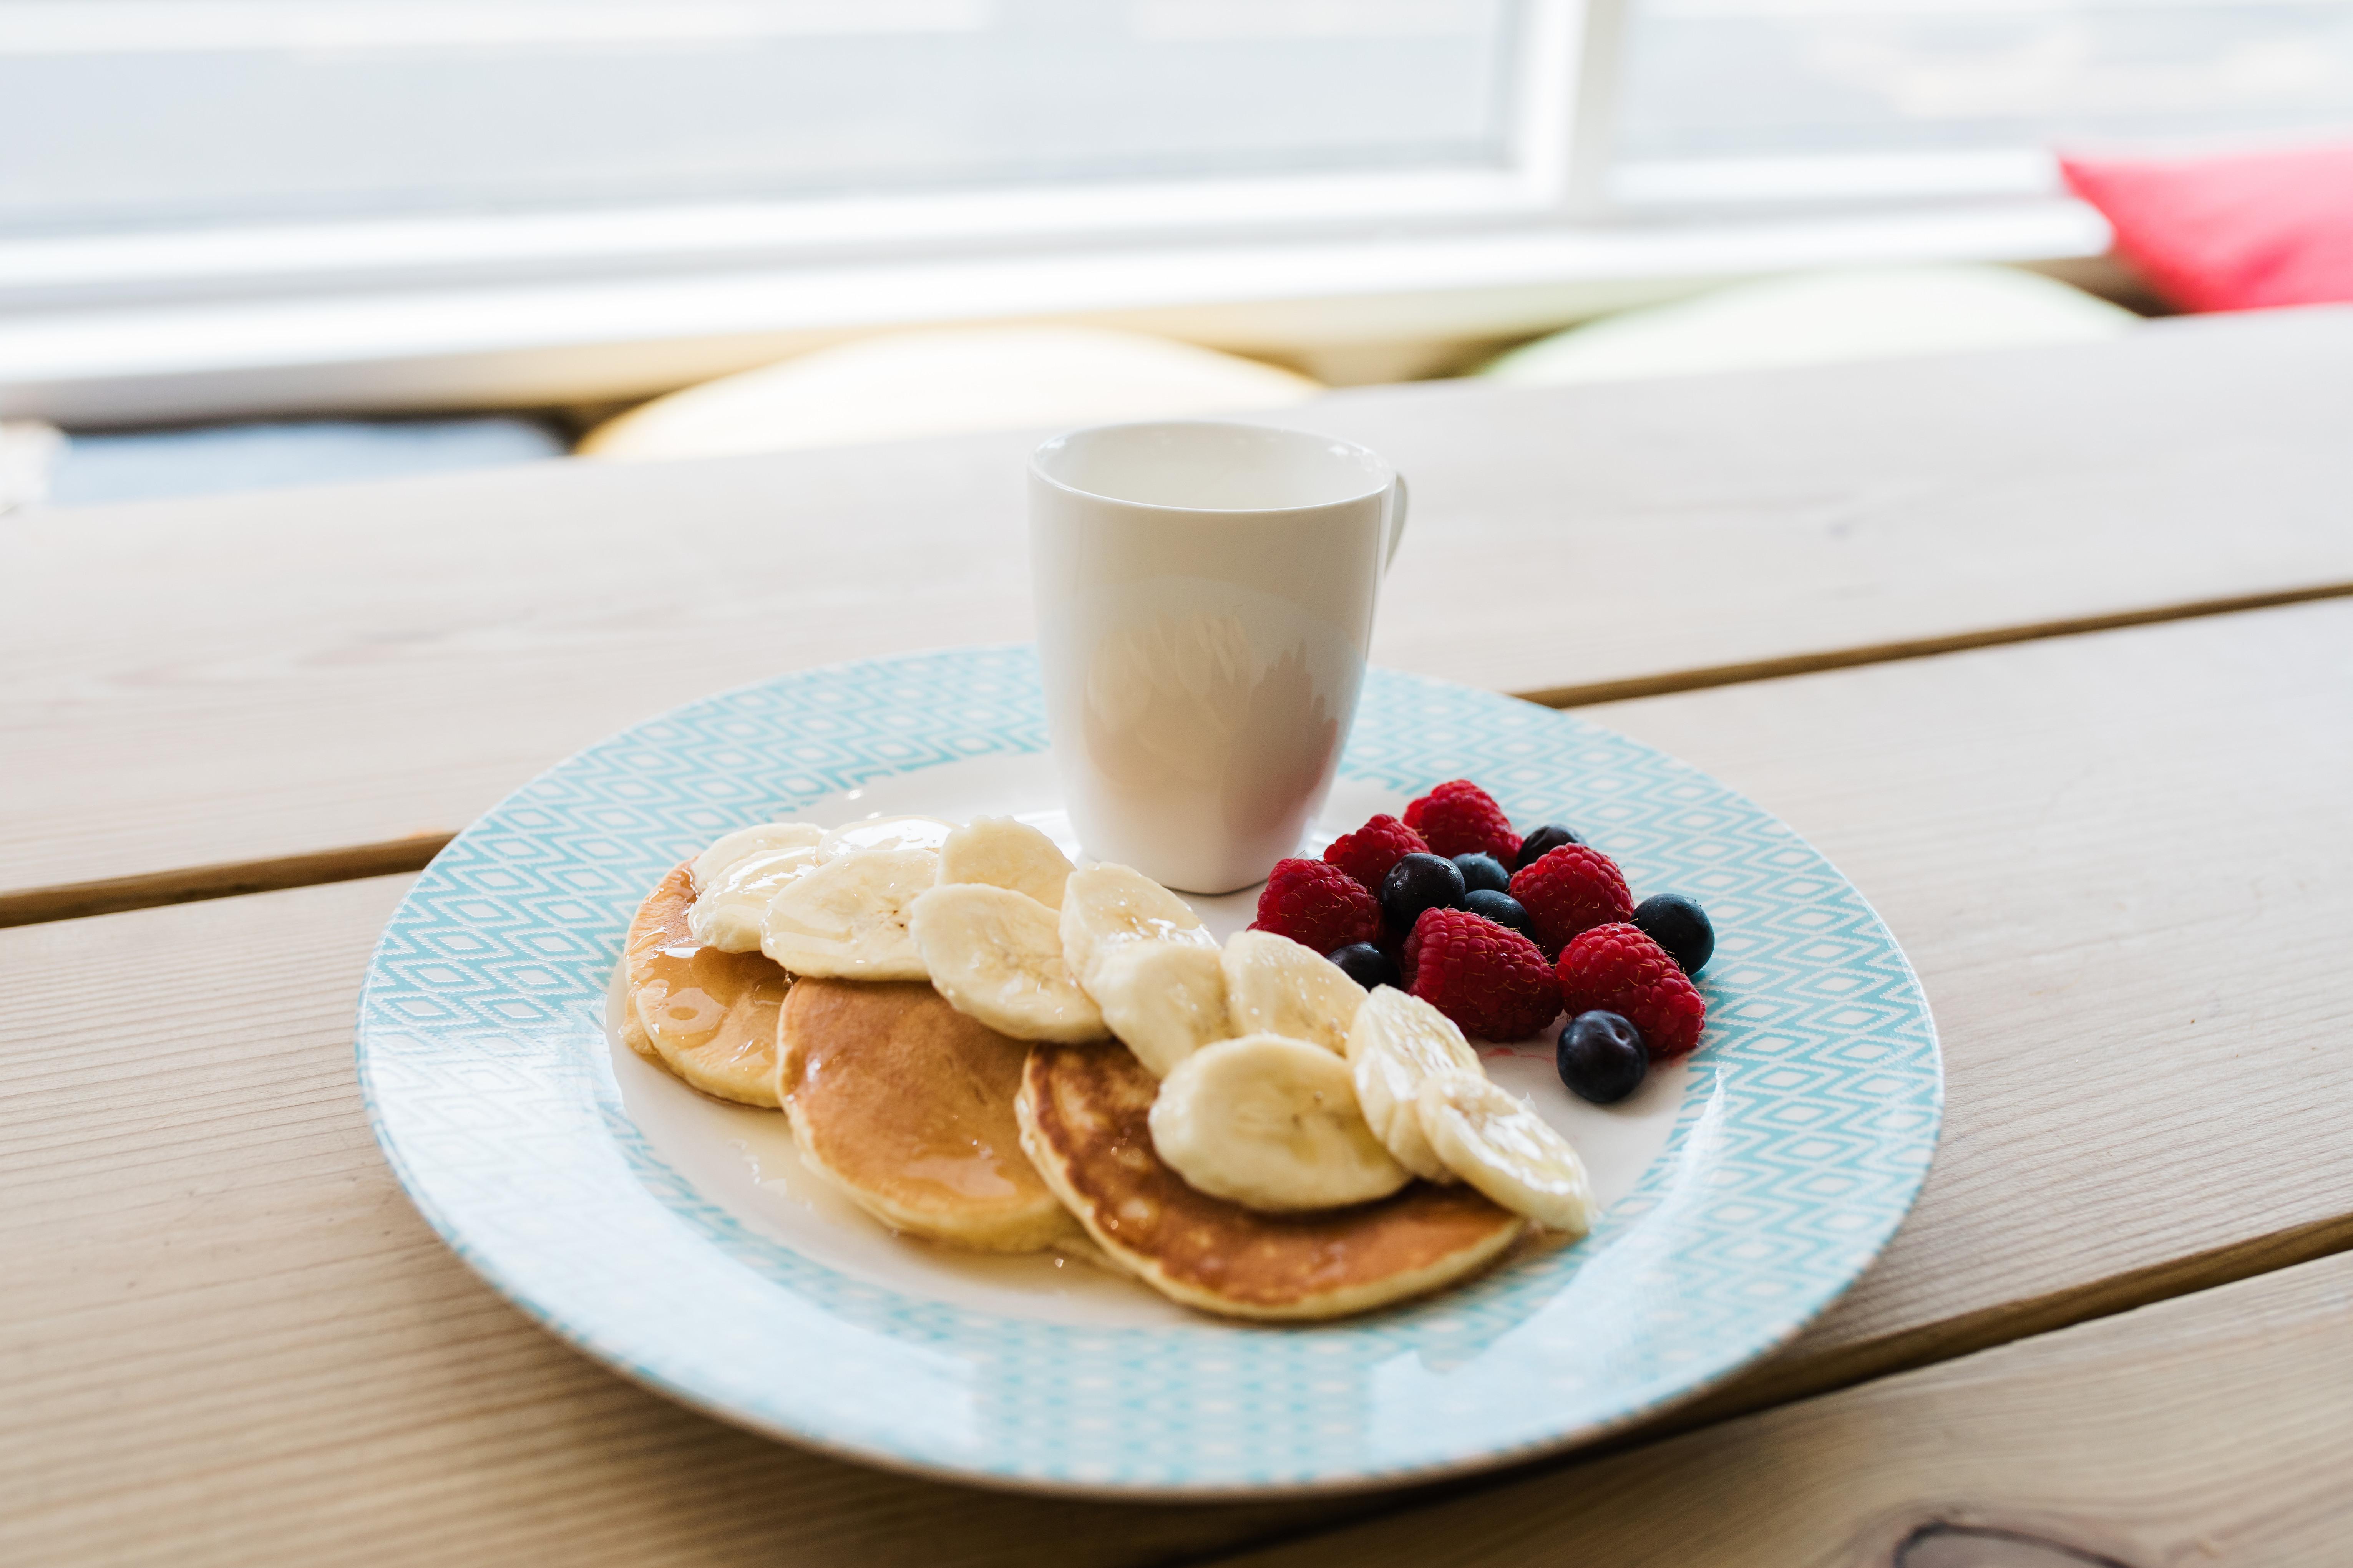 Saturday Breakfast, Brunch or Lunch